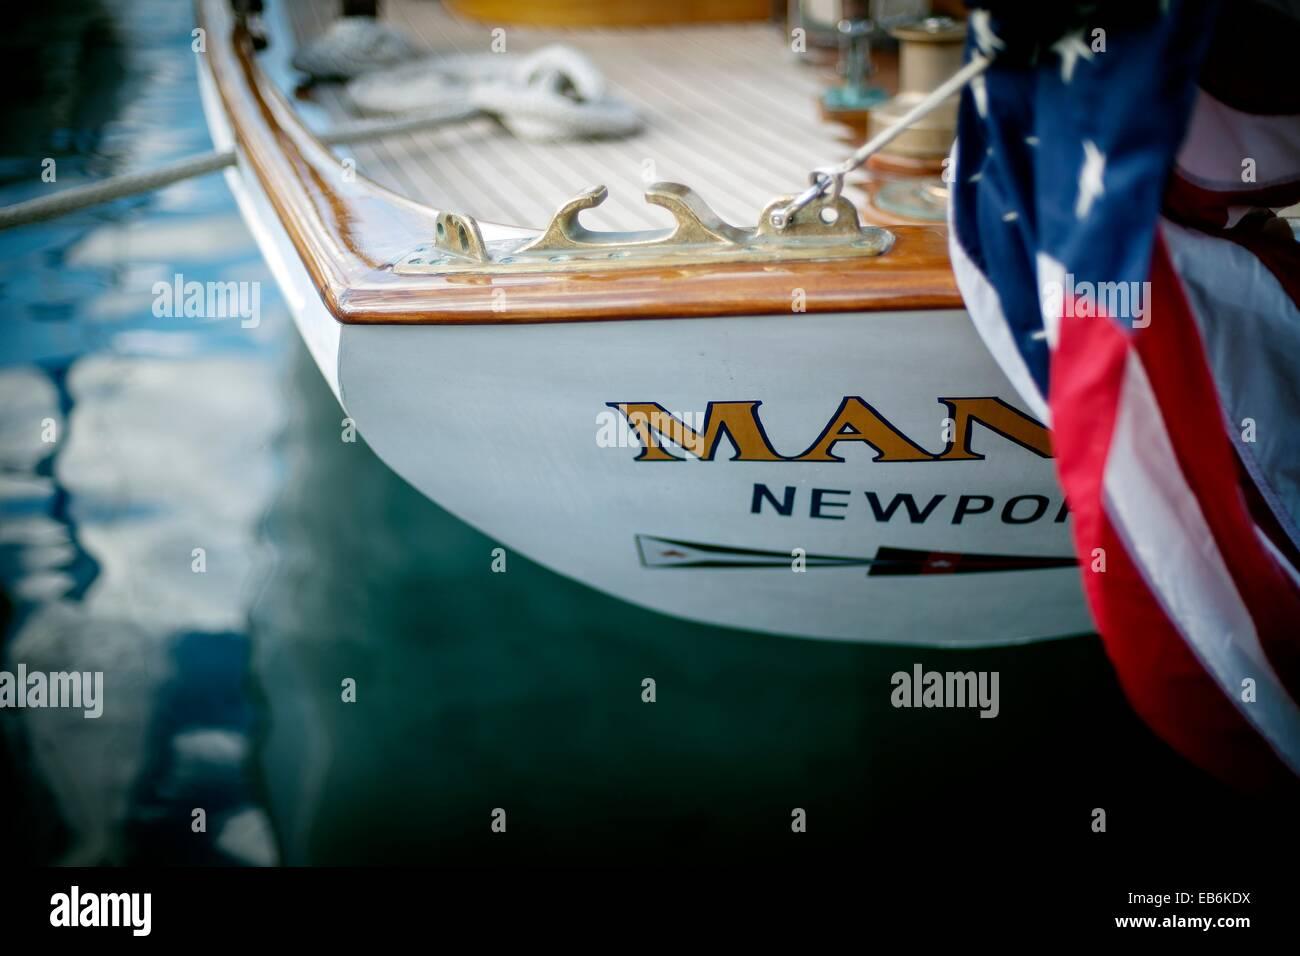 Popa del barco velero Manitou, Newport, en América, en 1937, Stern de velero Manitou, Newport, Estados Unidos, 1937 Foto de stock